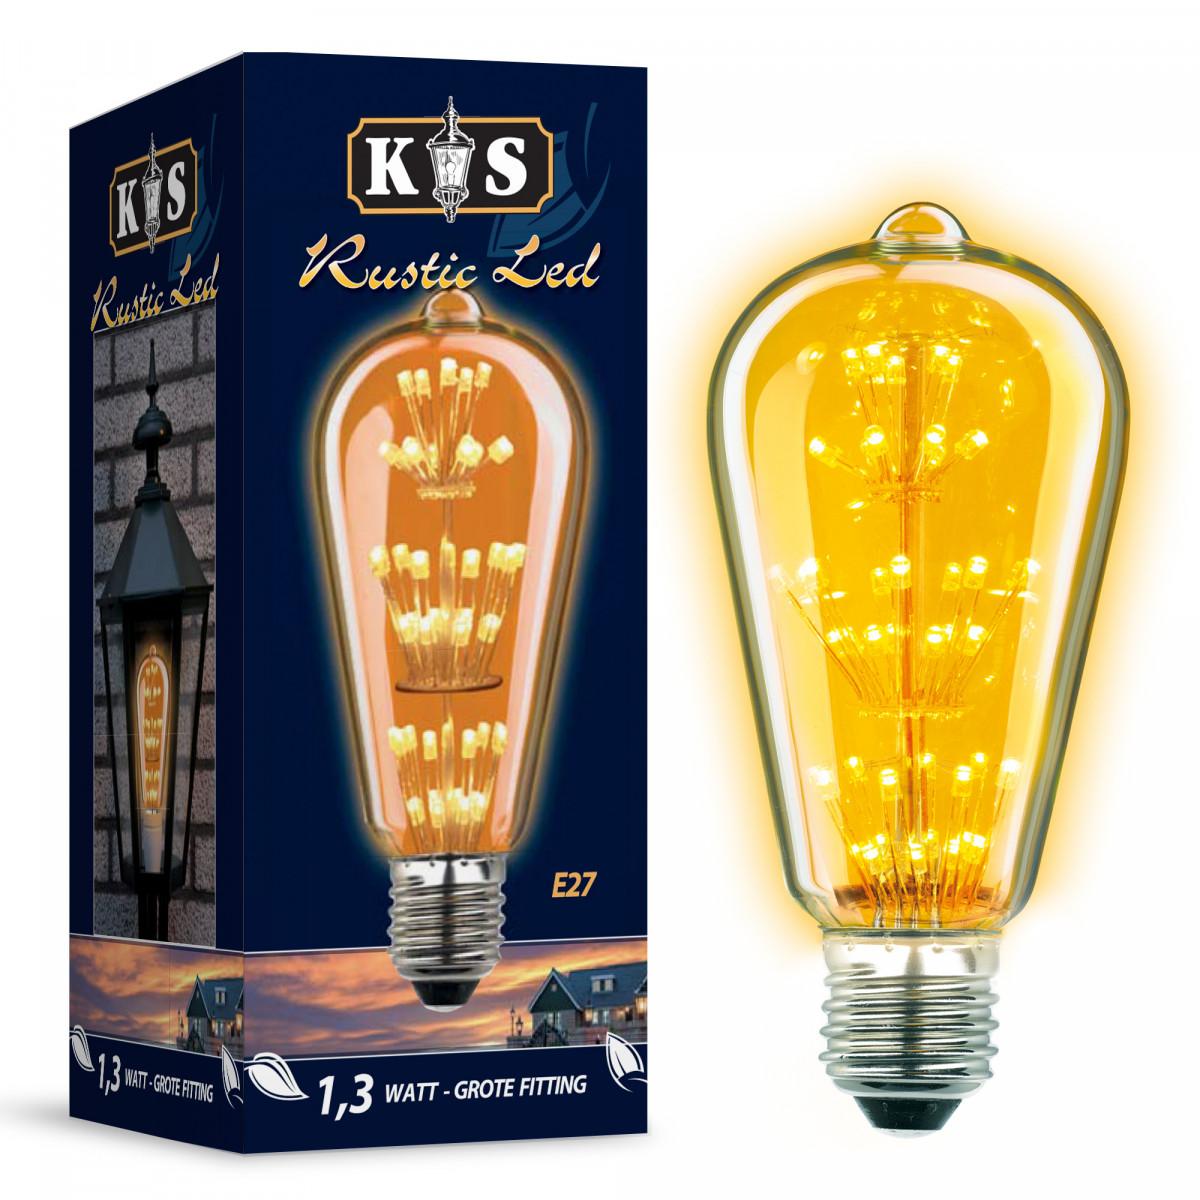 Rustic LED Leuchtmittel